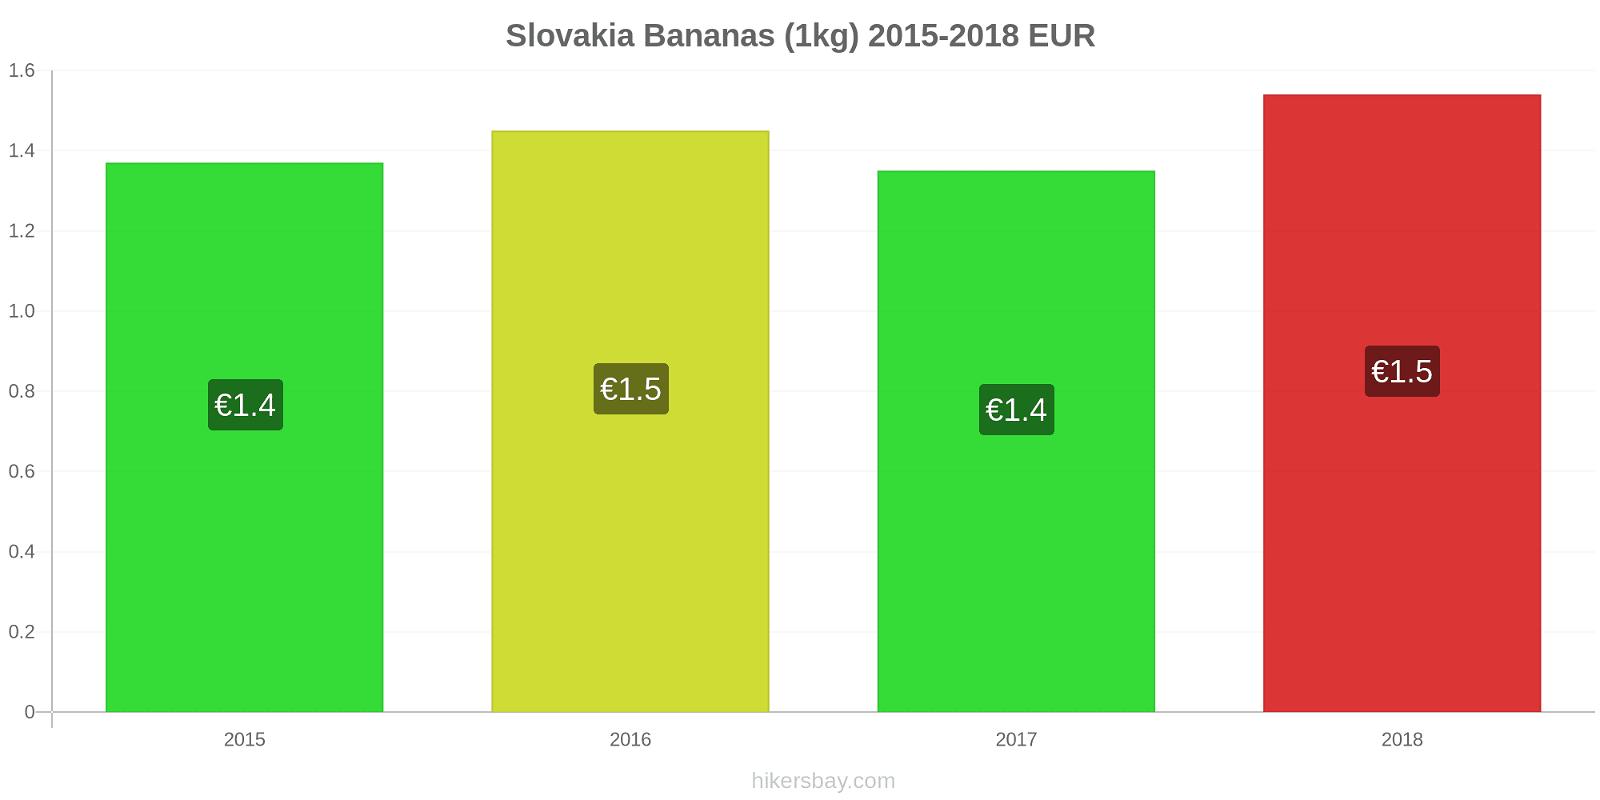 Slovakia price changes Bananas (1kg) hikersbay.com